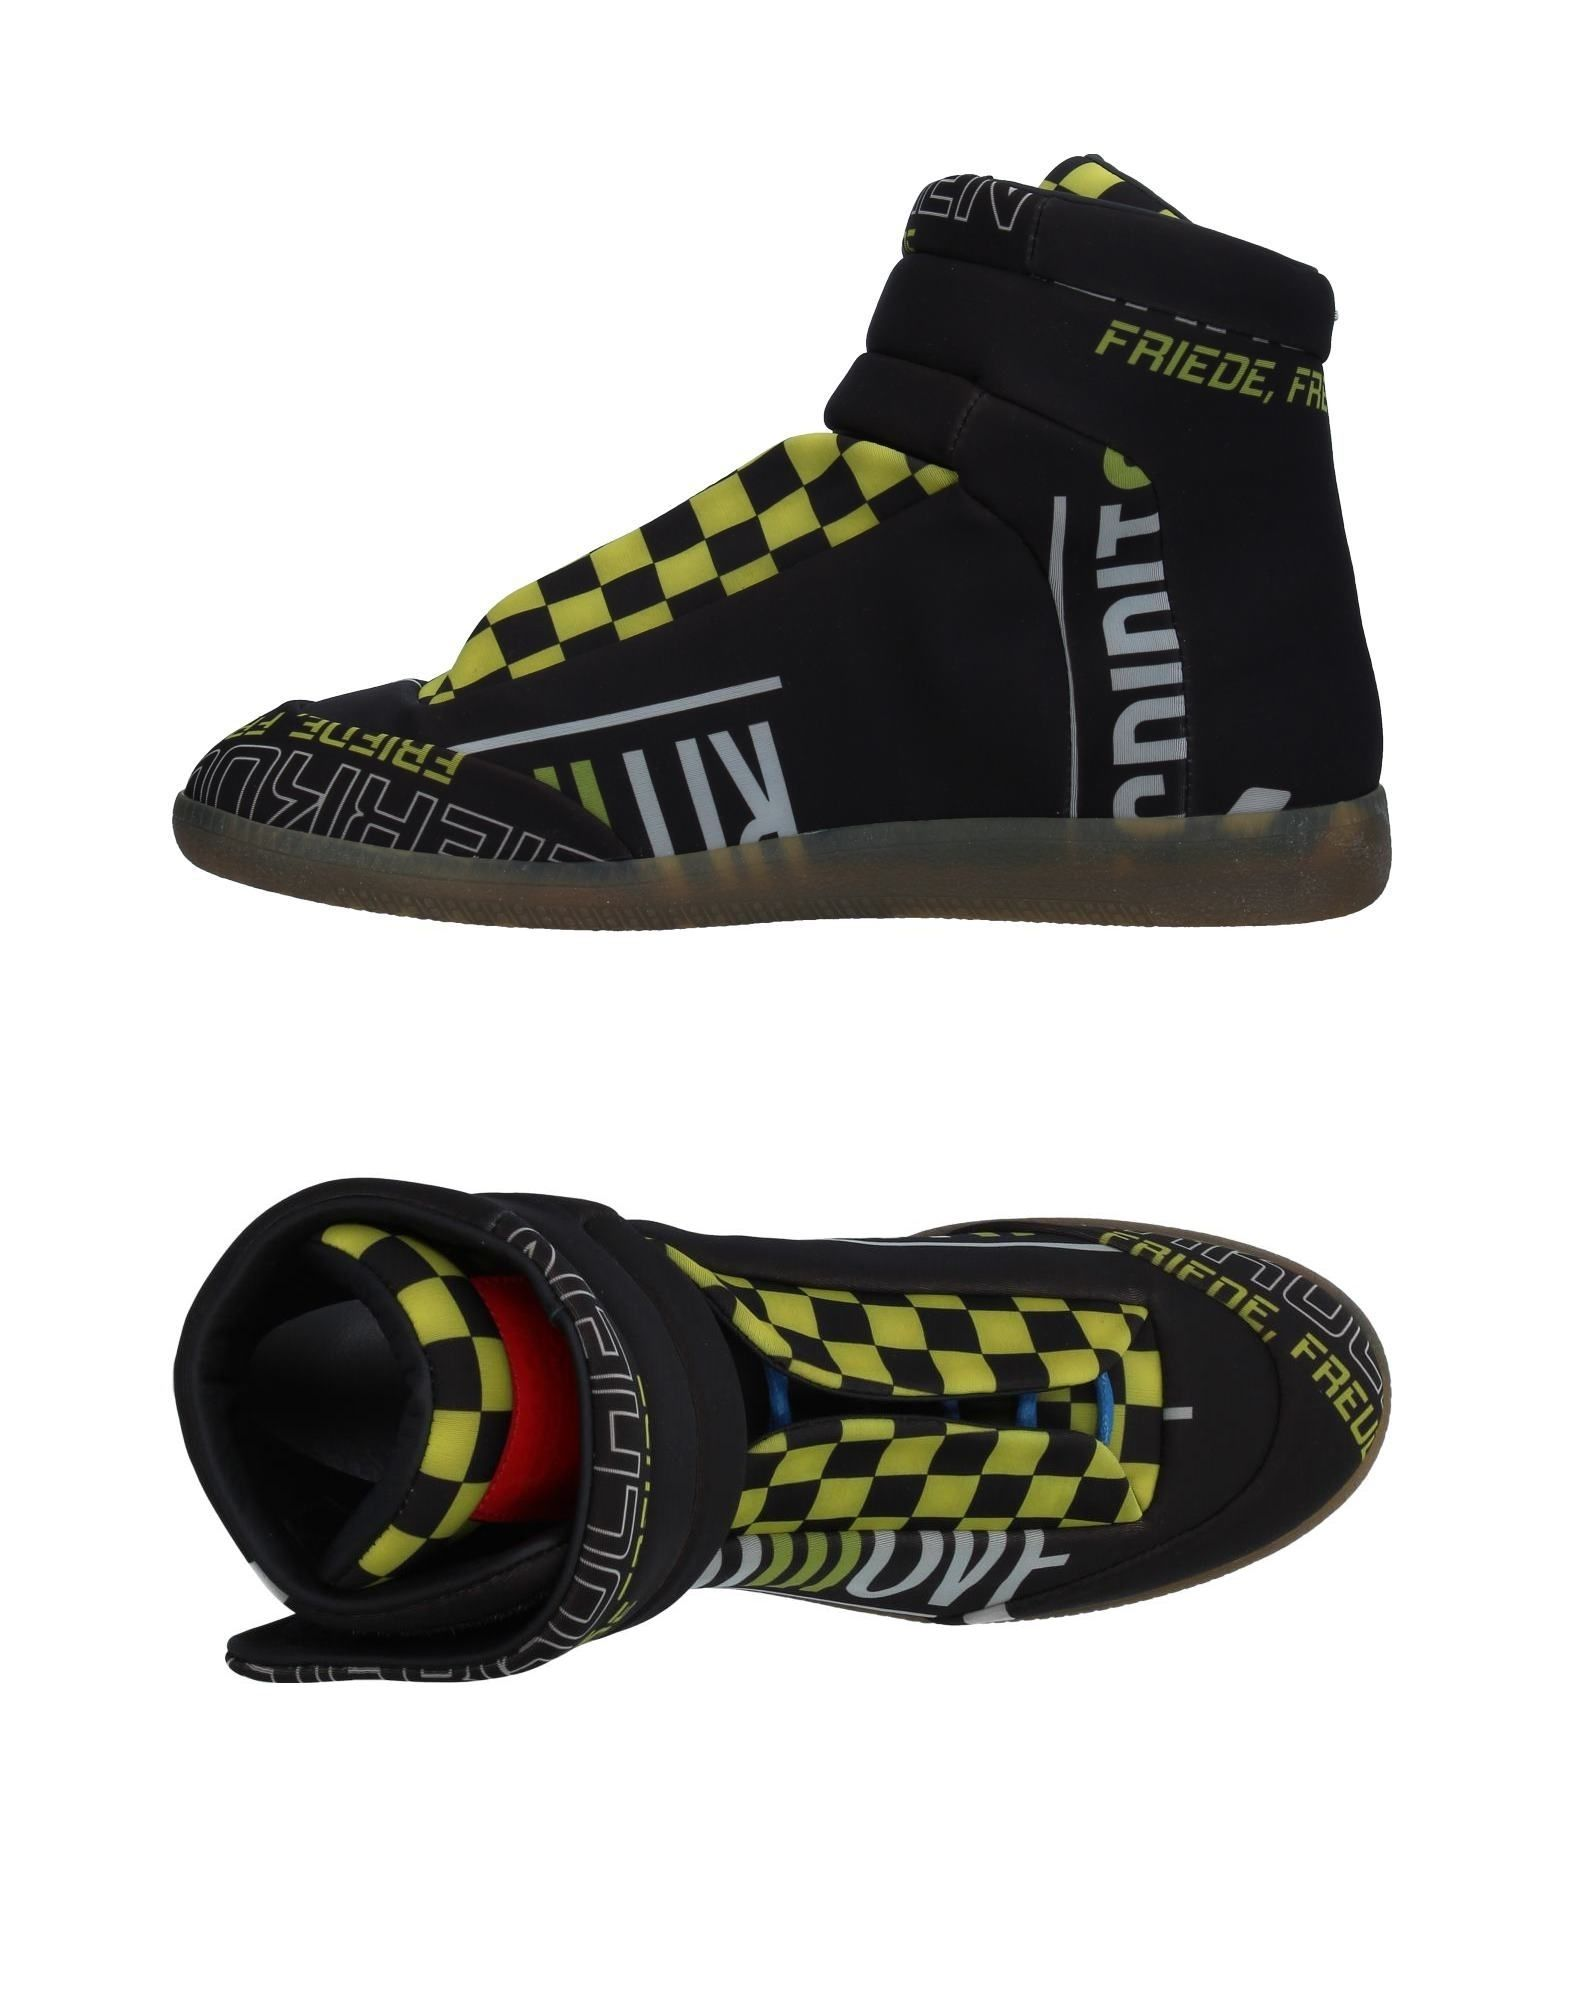 Maison Margiela Sneakers Herren  11334334HG Gute Qualität beliebte Schuhe